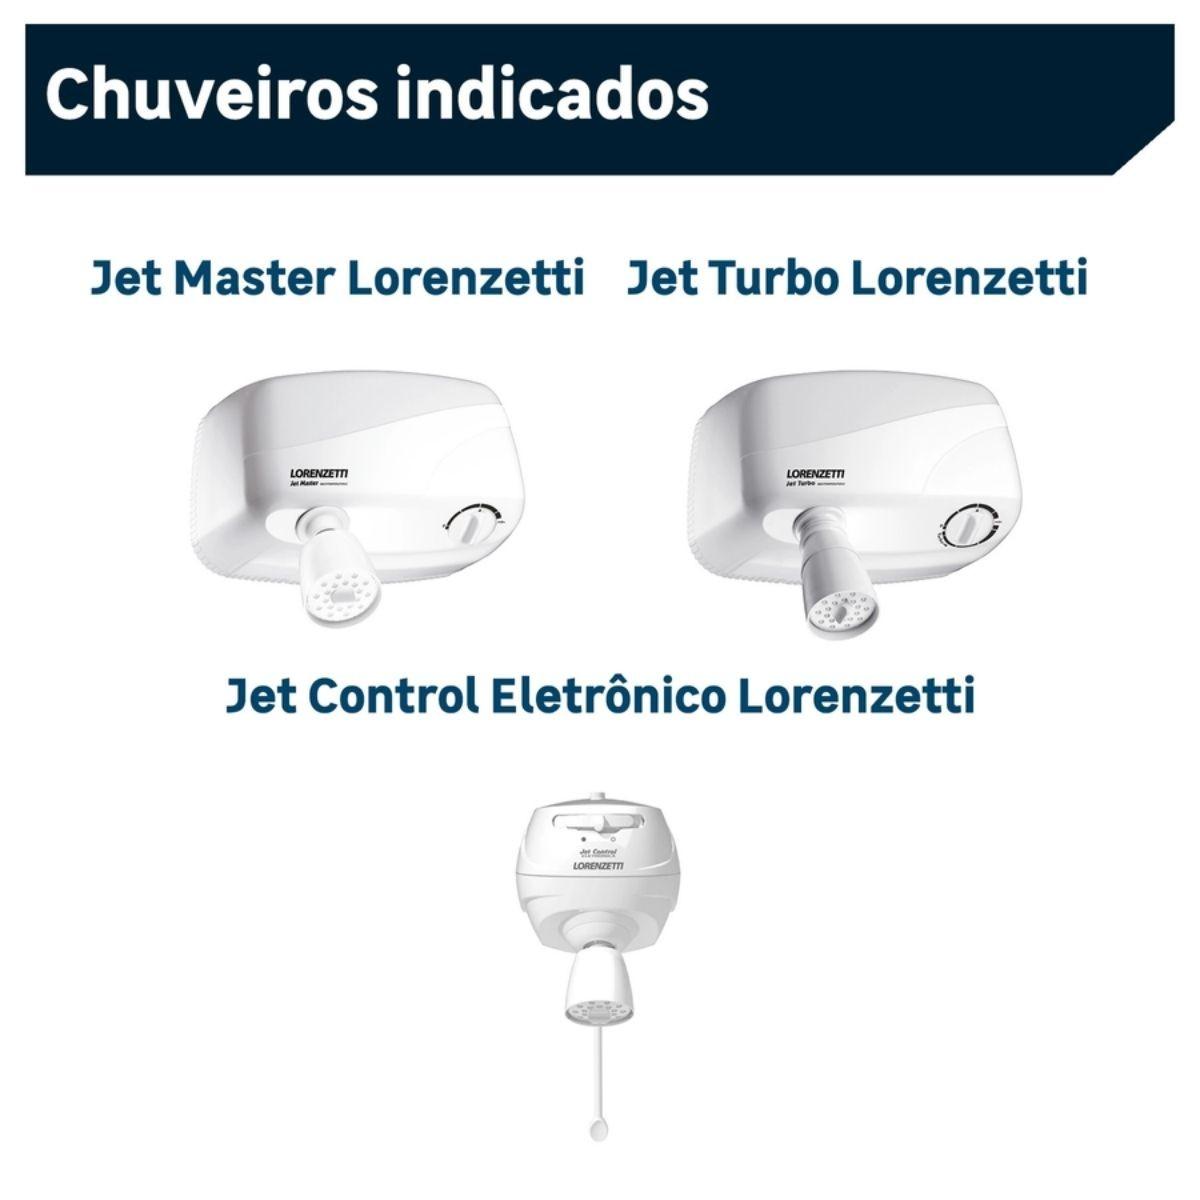 Resistência Jet Control Eletrônica / Jet Turbo 220V 7800W Lorenzetti Original